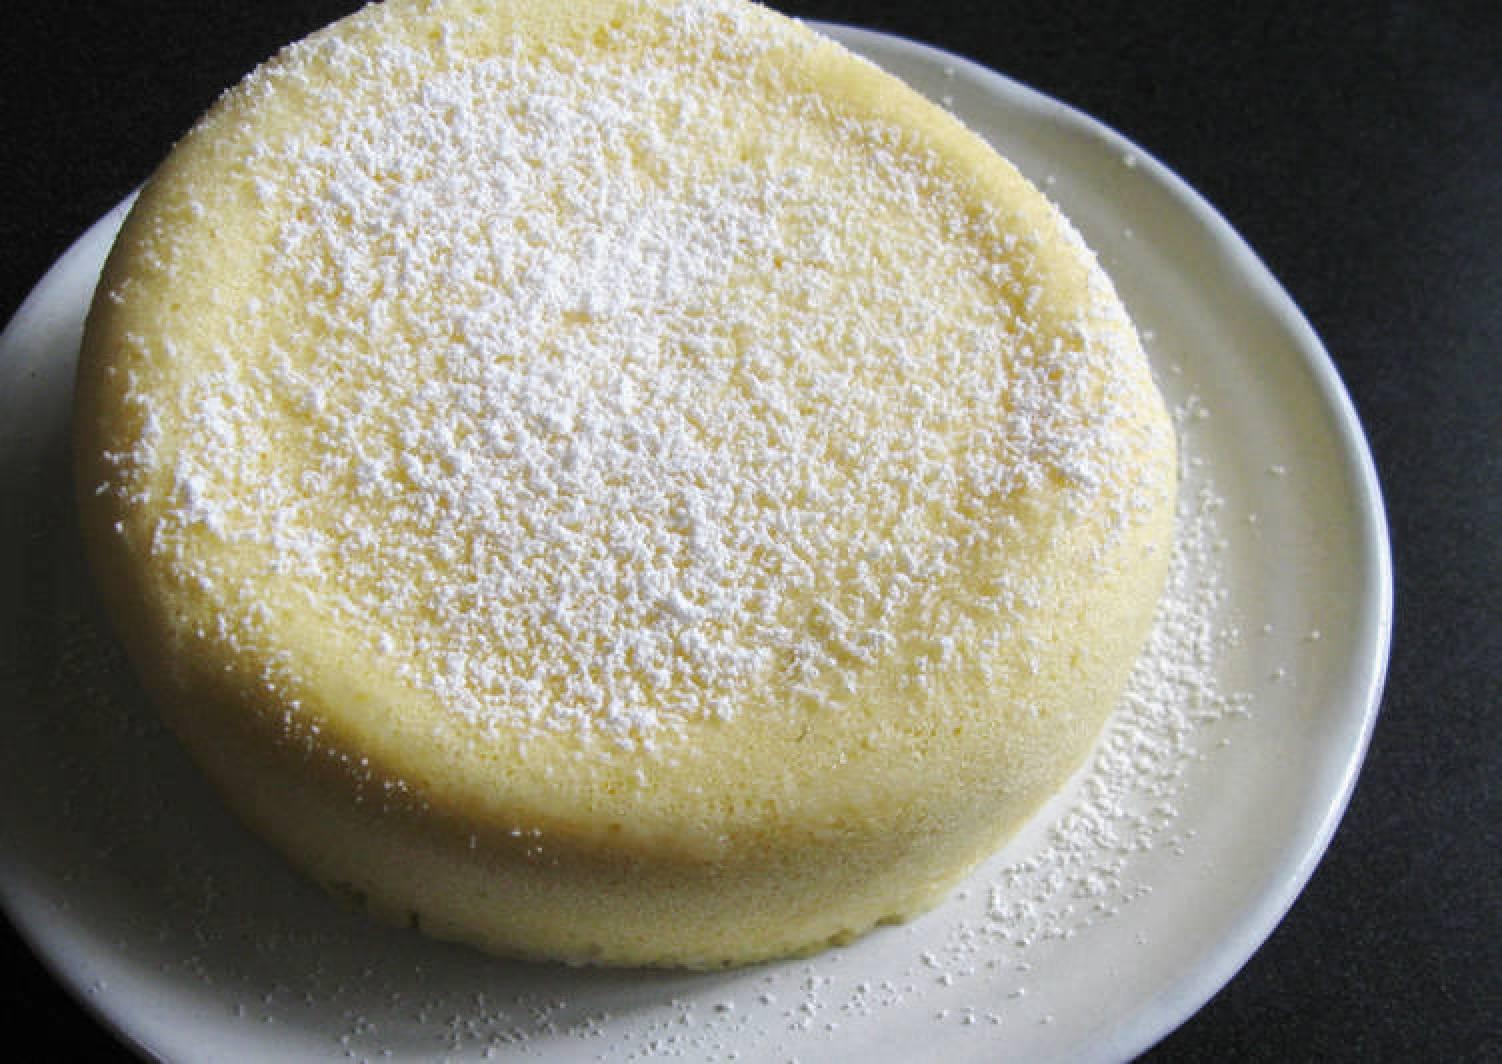 Microwave Instant Sponge Cake